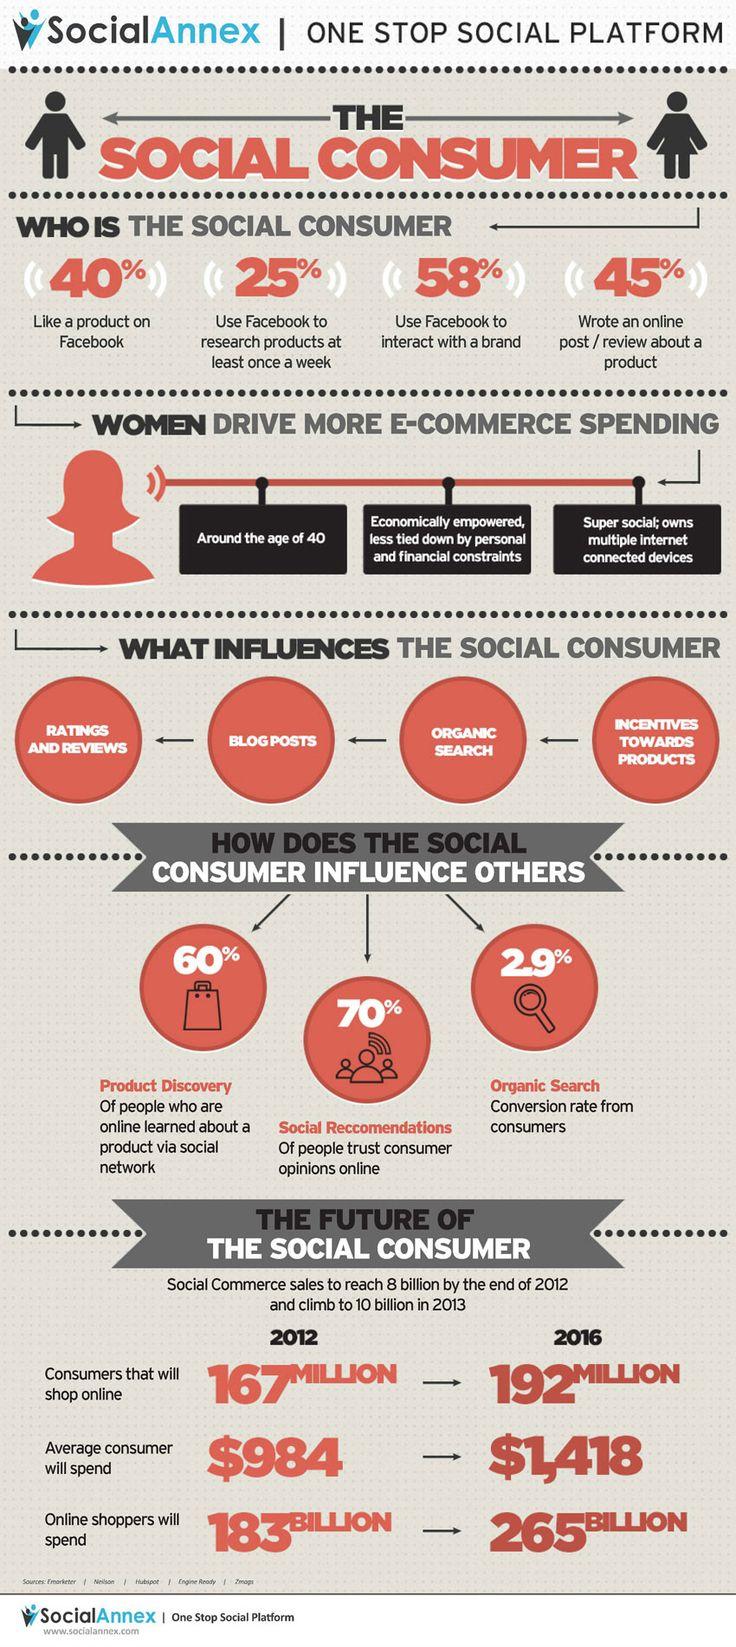 Social Annex - Social Consumer Infographic ... #SocialConsumer #SocialMedia #Retail #Infographic